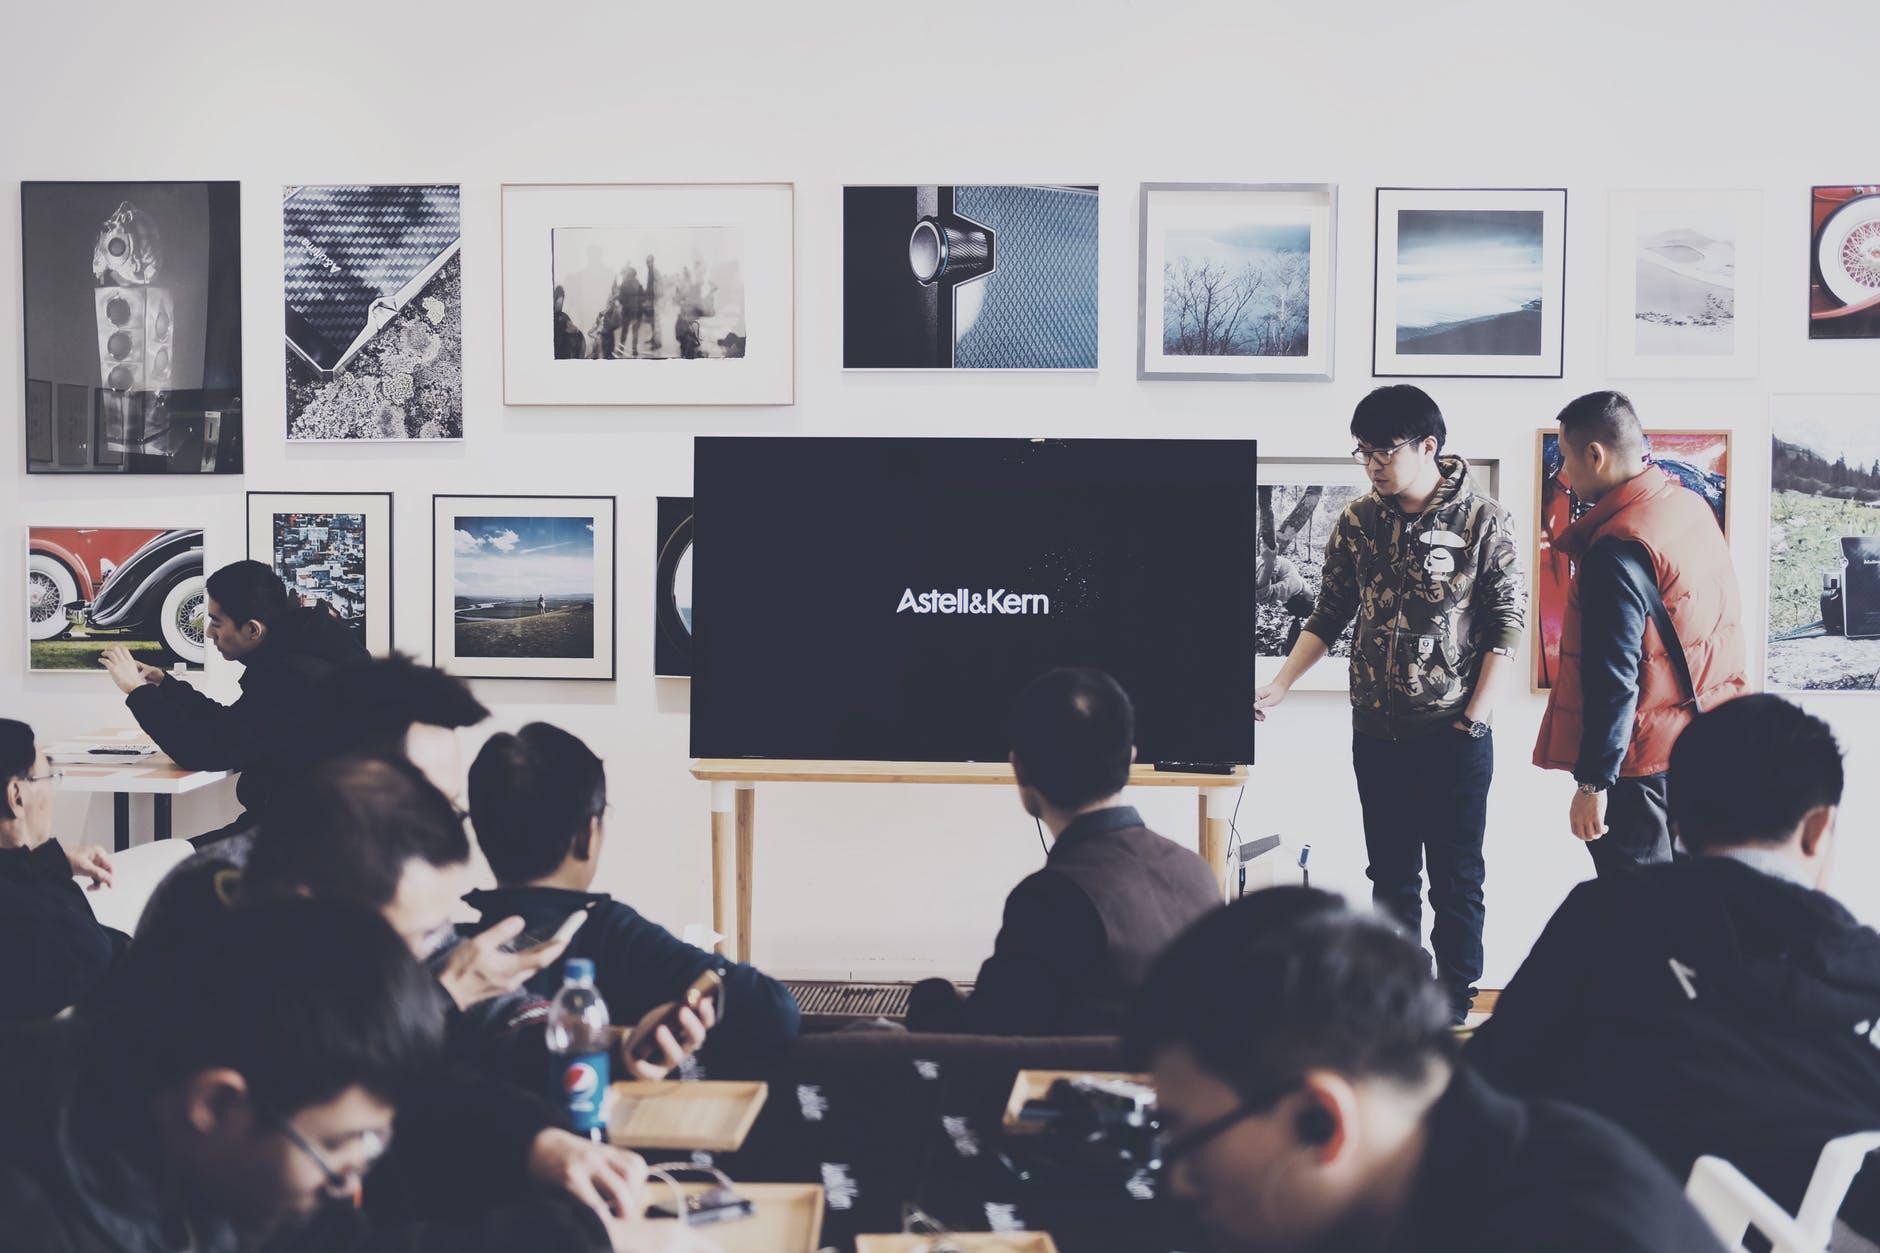 group of people in art exhibit